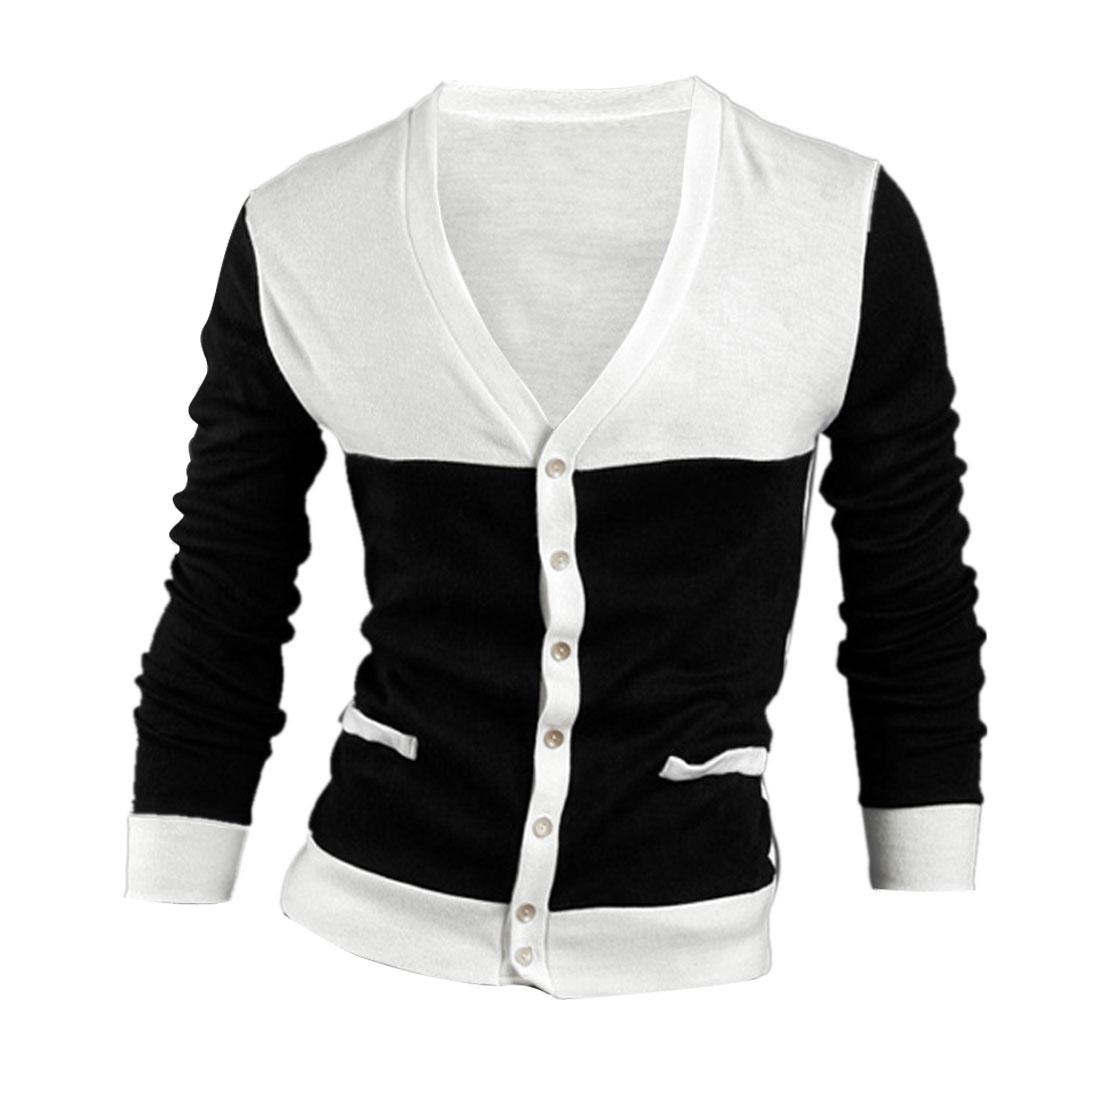 Men V Neck Buttons Up Fake Pockets Decor Black White Cardigan S